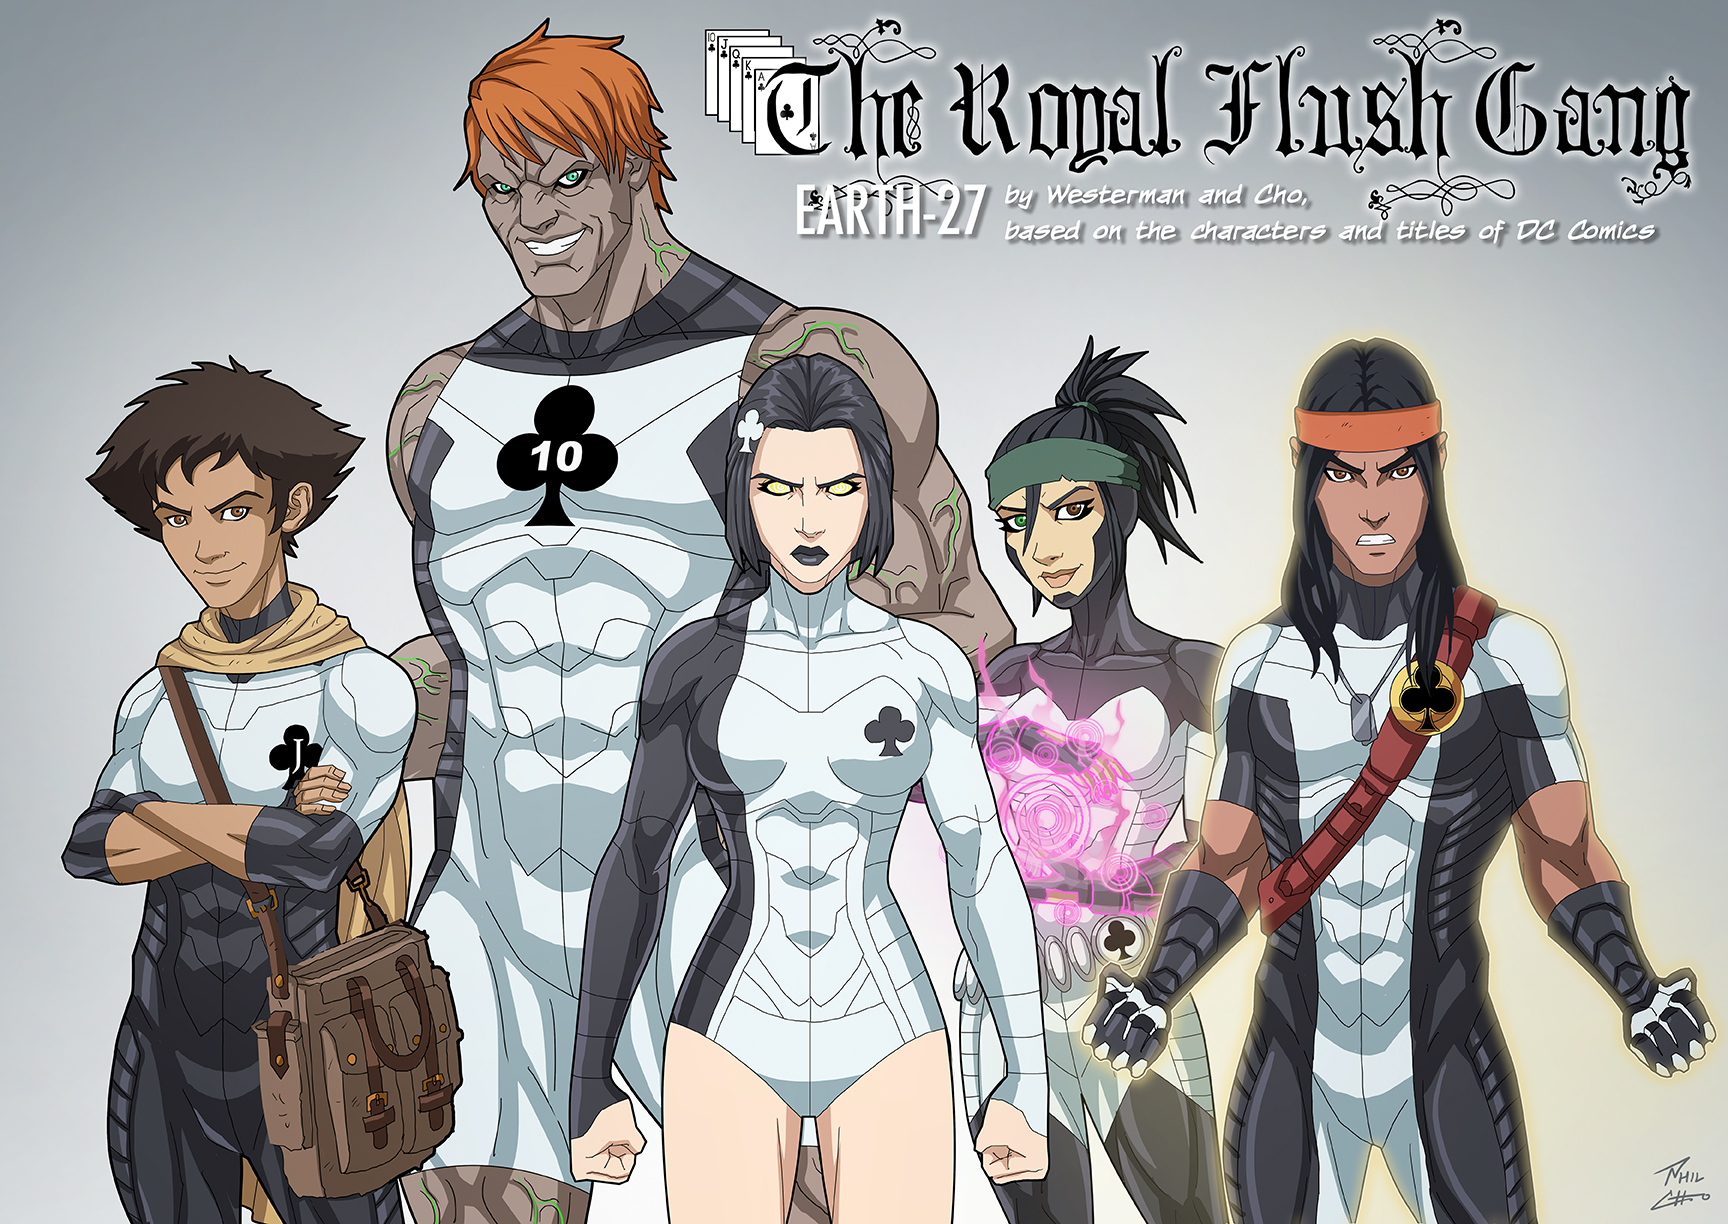 royal_flush_gang_web.jpg